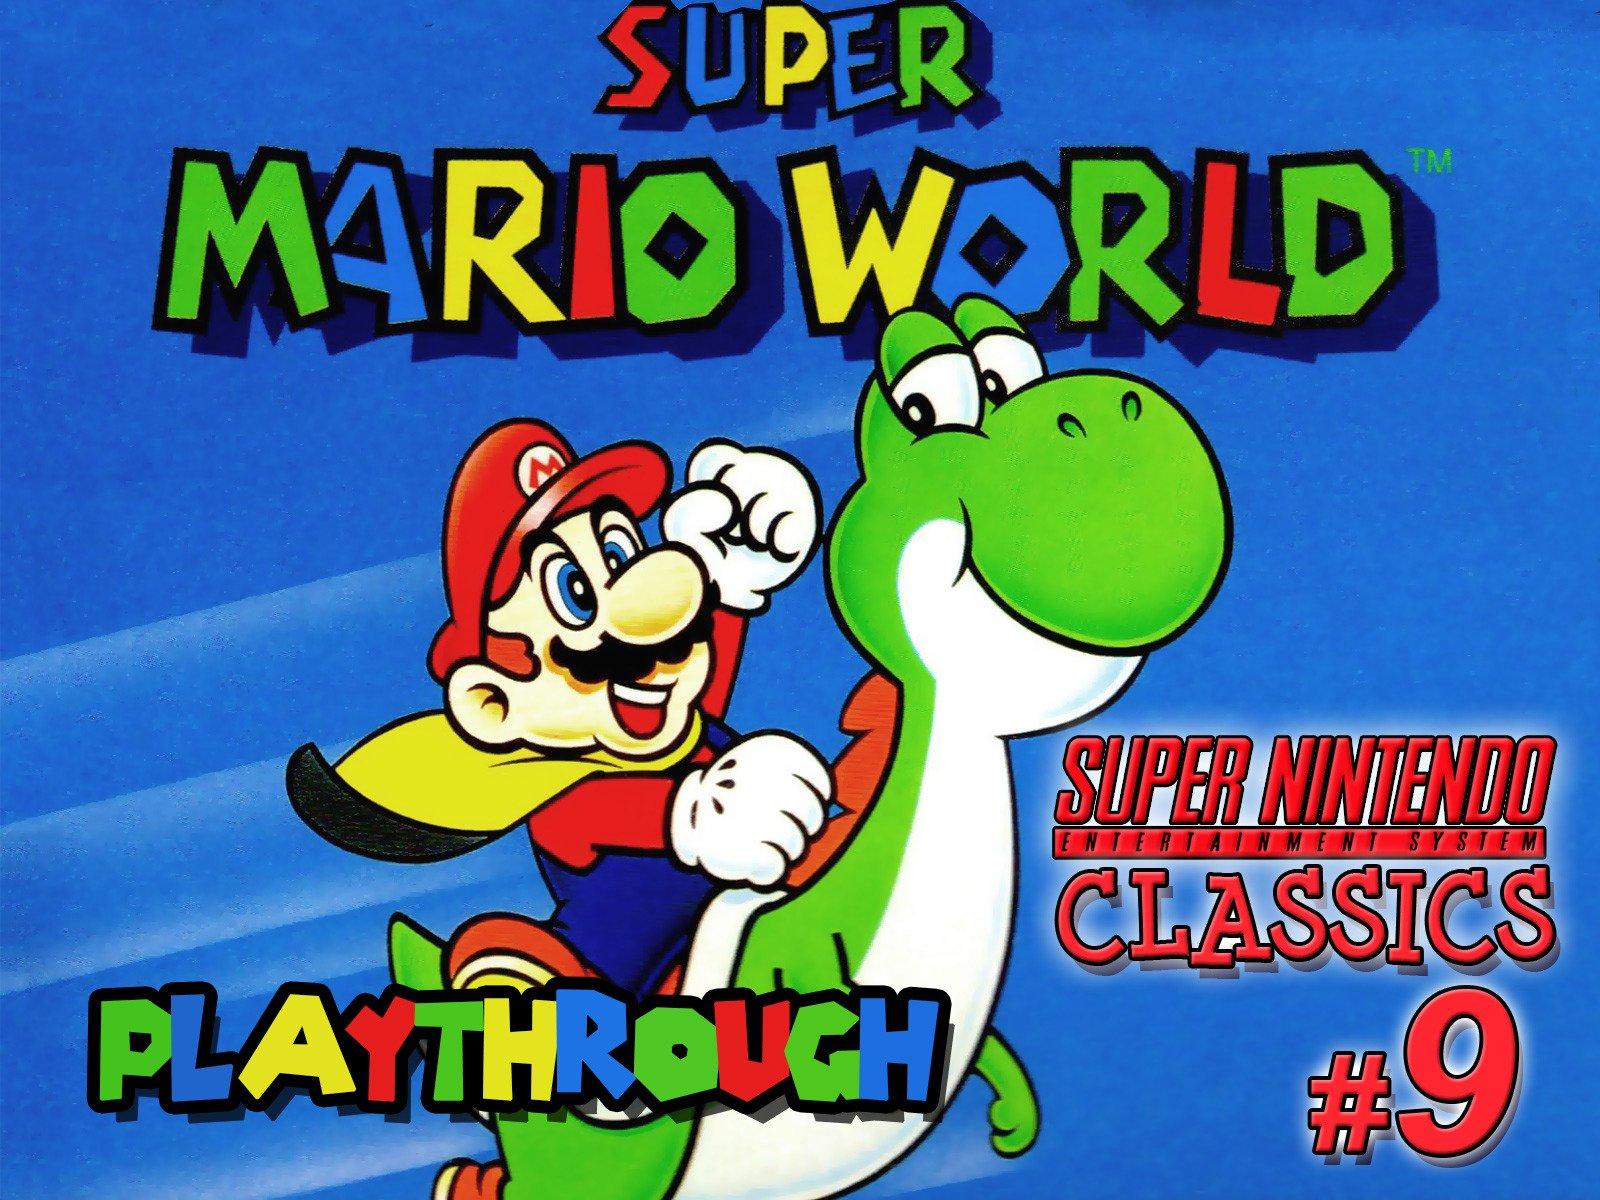 Clip: Super Mario World Playthrough (SNES Classics 9) - Season 1